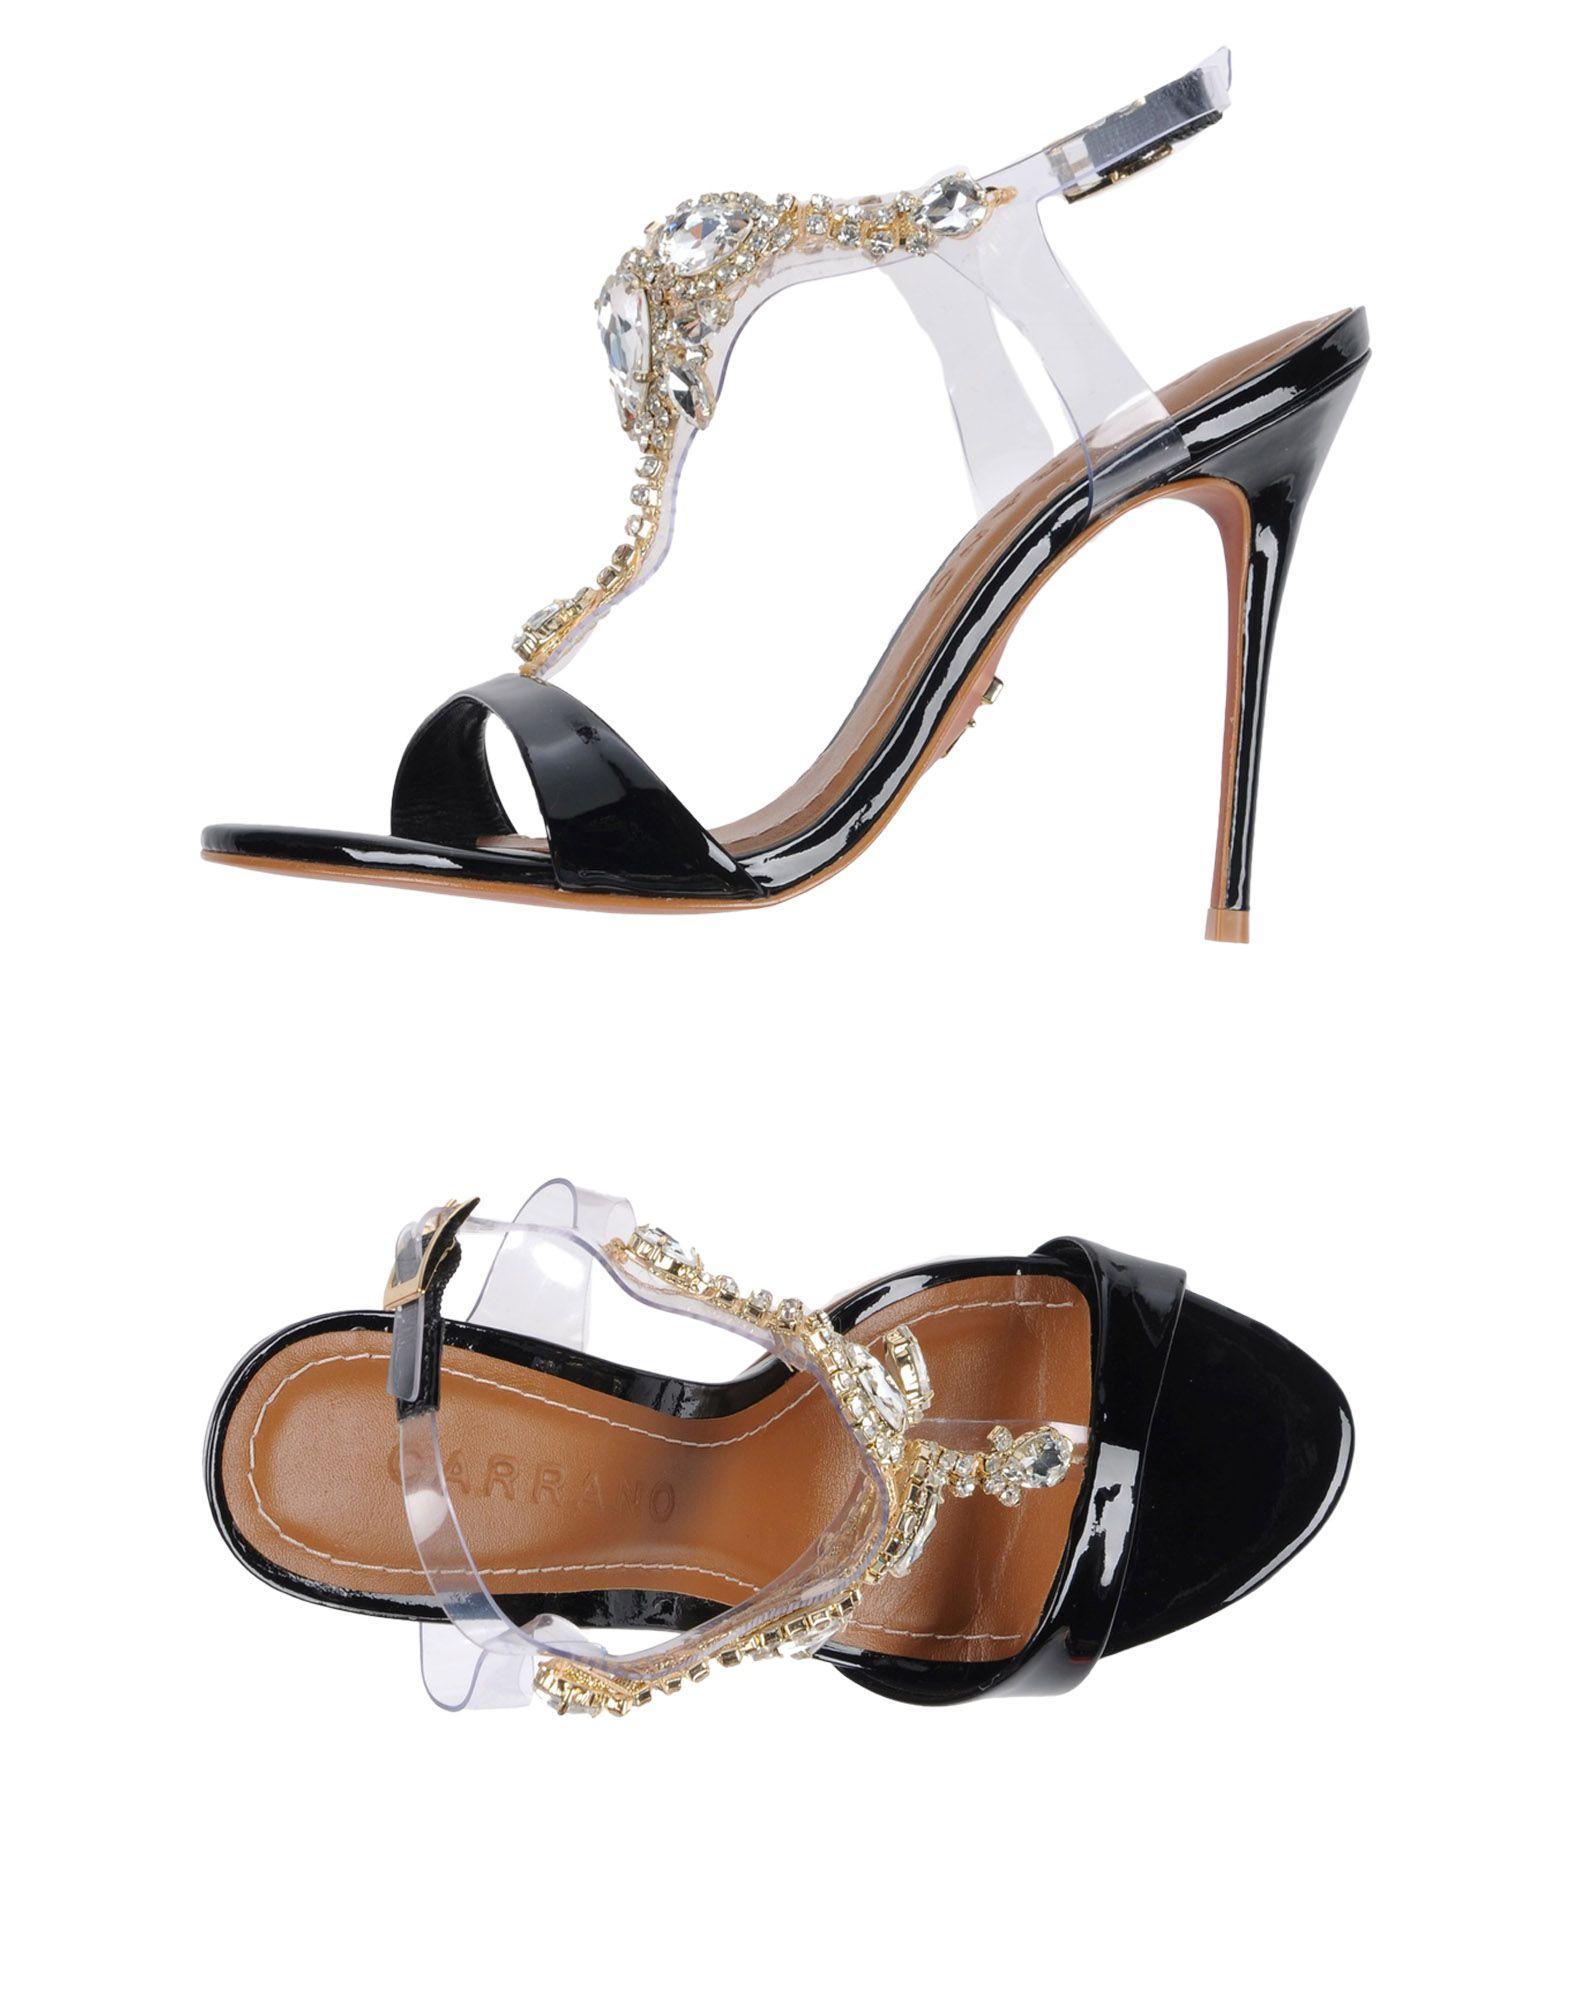 ca4d35734d589 Carrano Sandals In Black